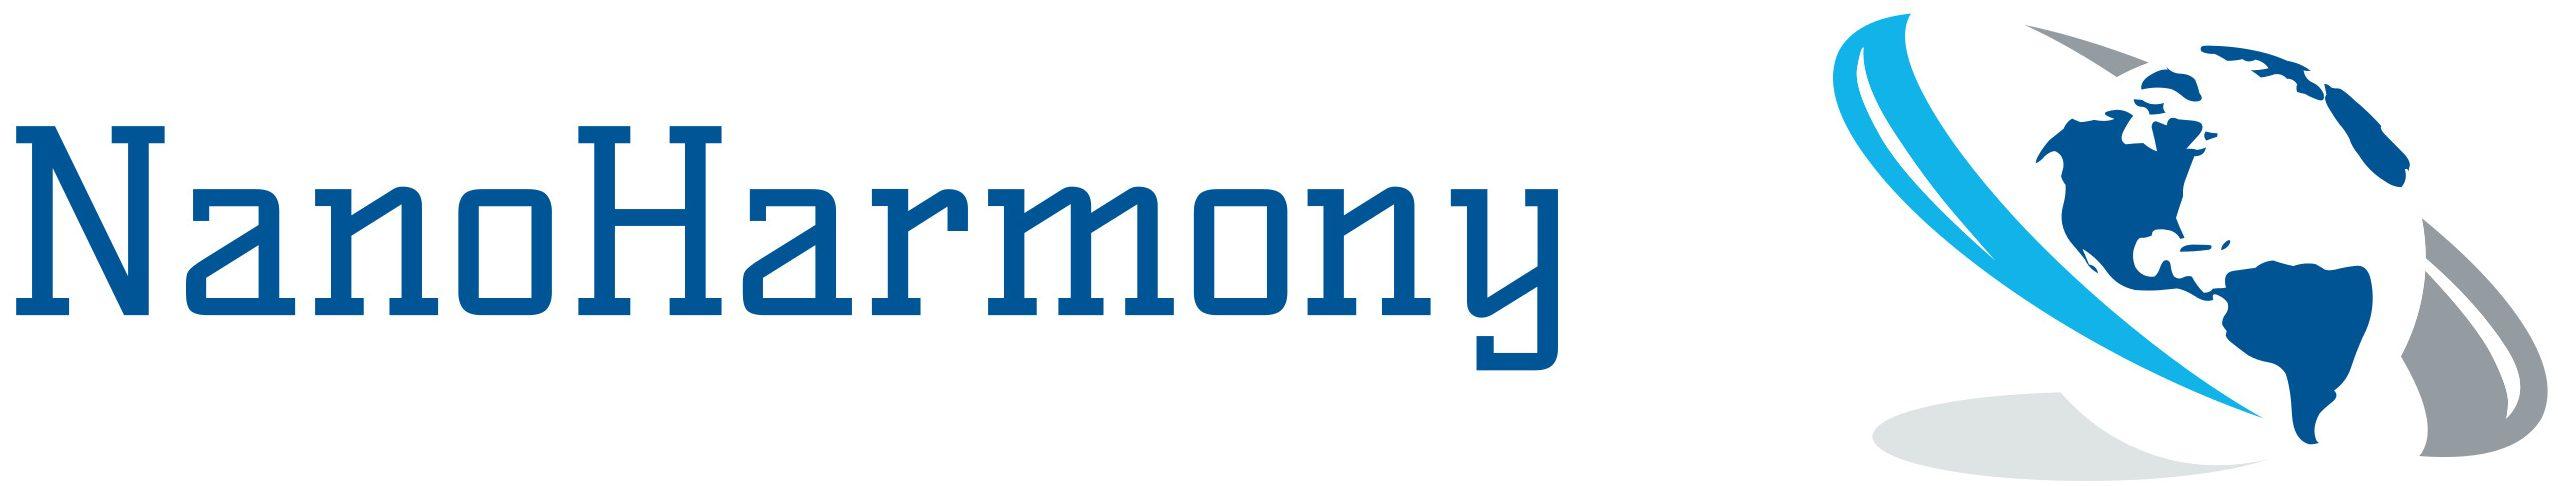 NanoHarmony